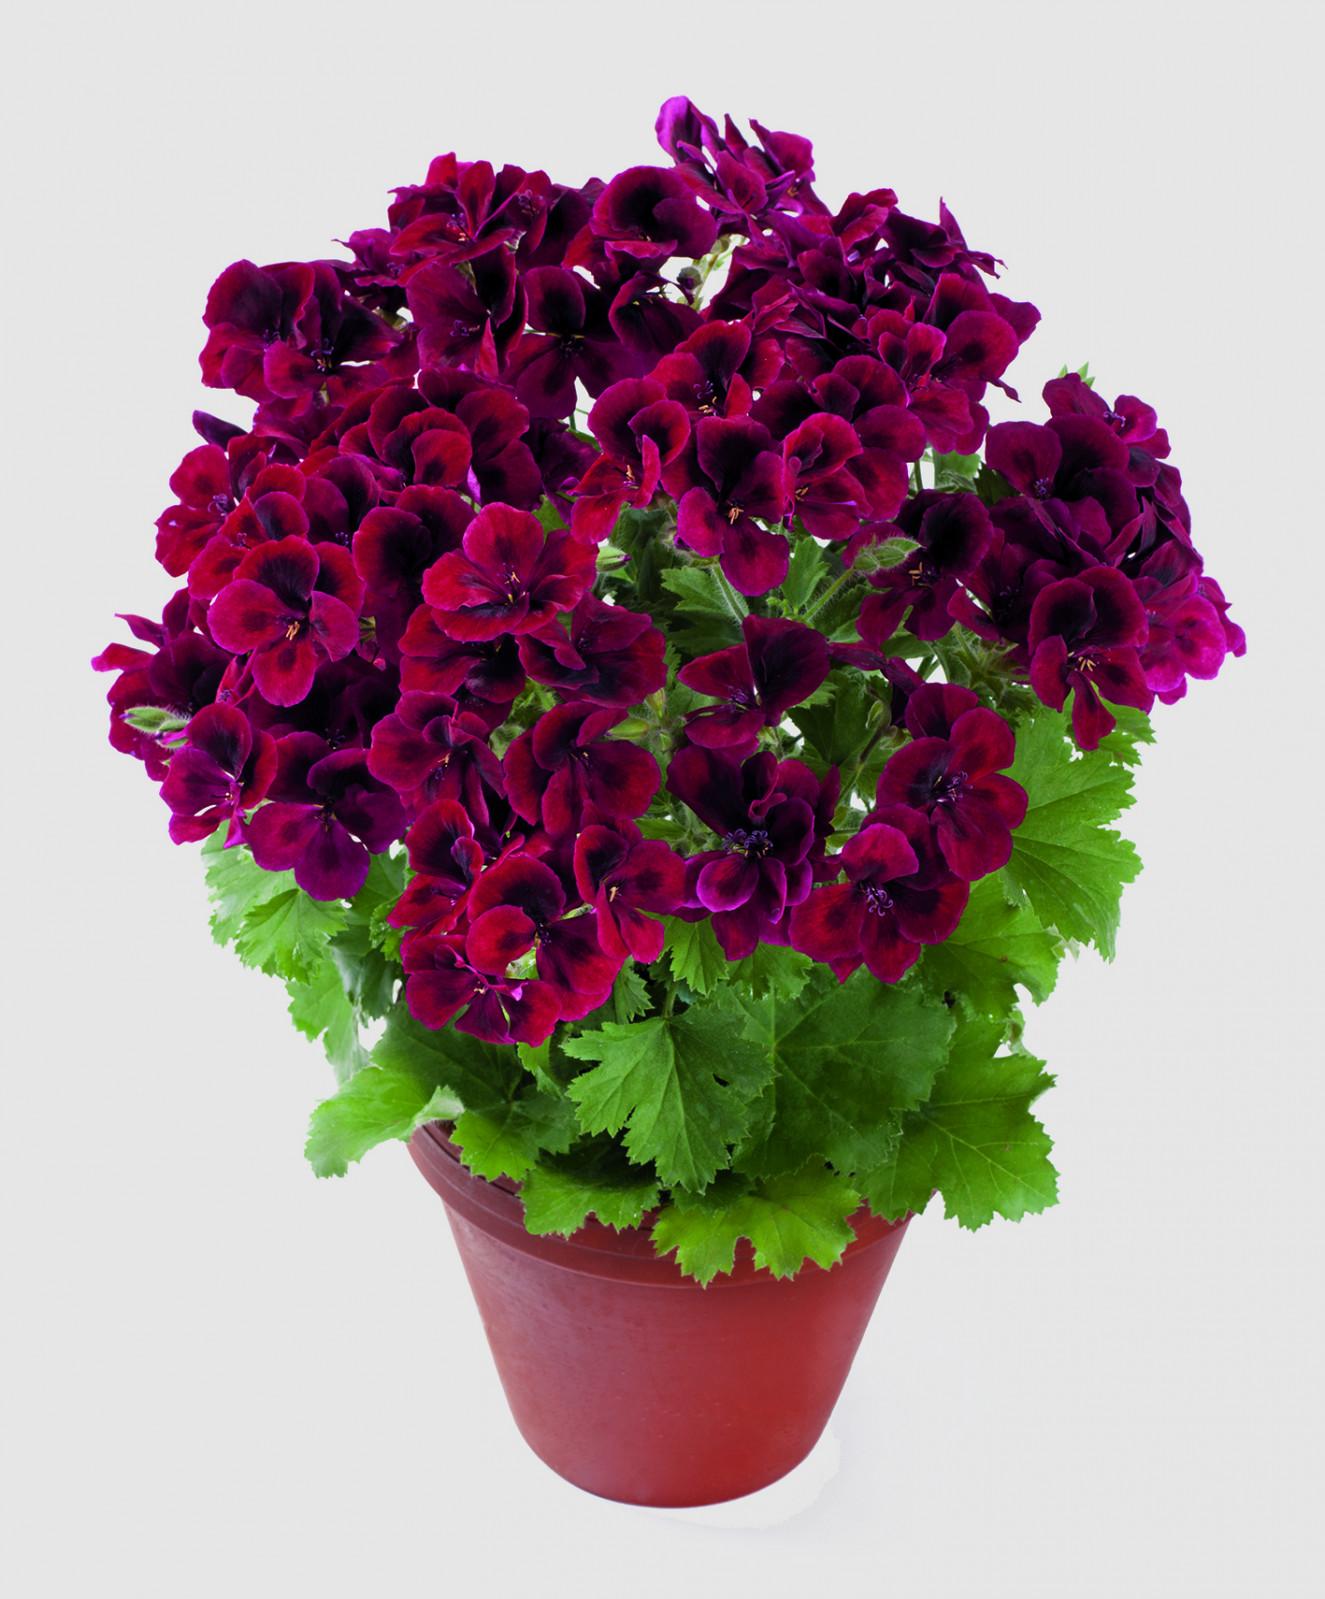 pac_Candy_Flowers_Dark_Red_13703_Topf_01_Presse.jpg